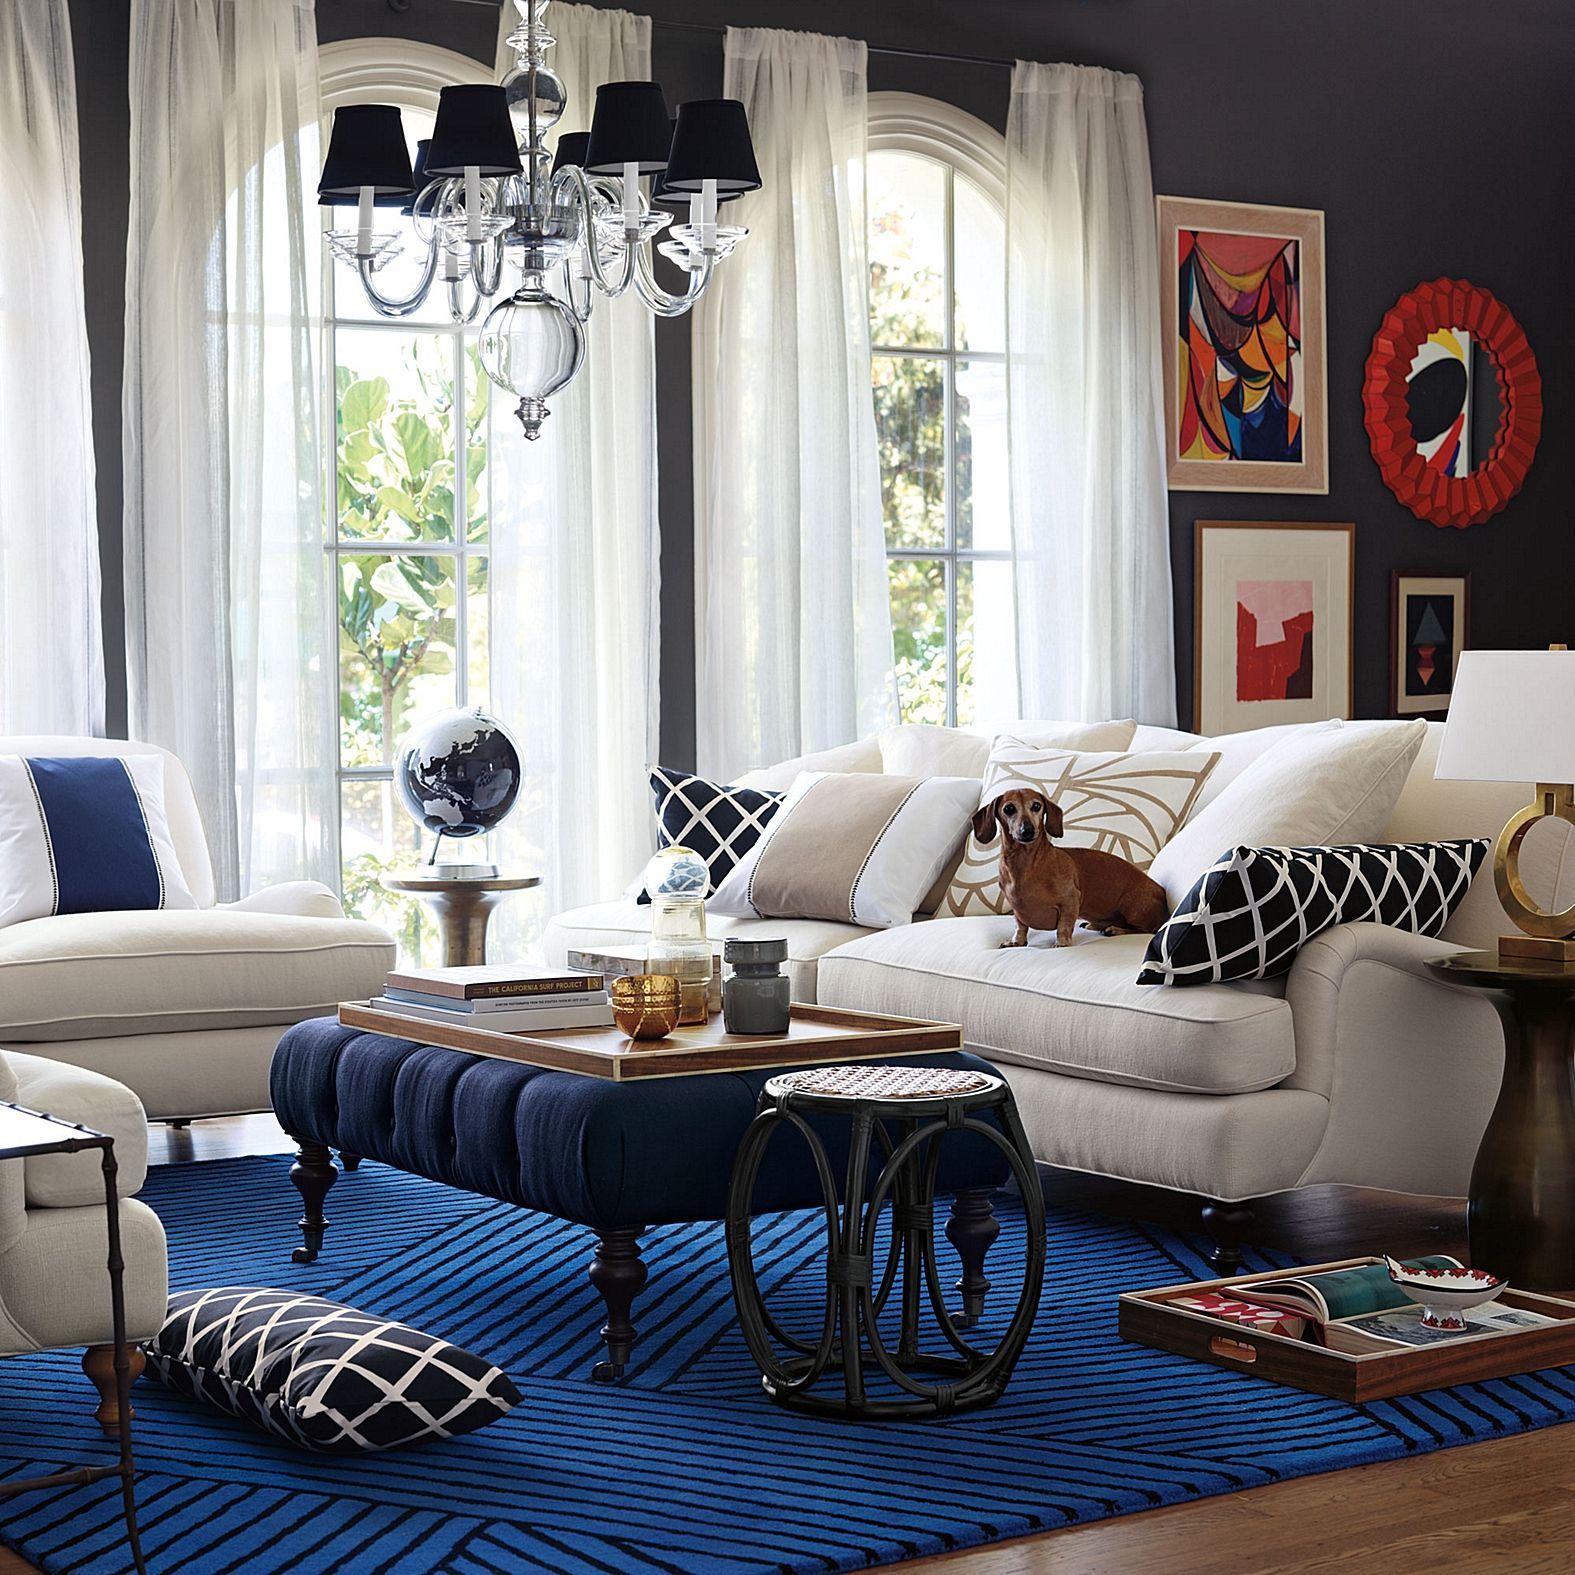 Fresh Rugs for Blue Walls